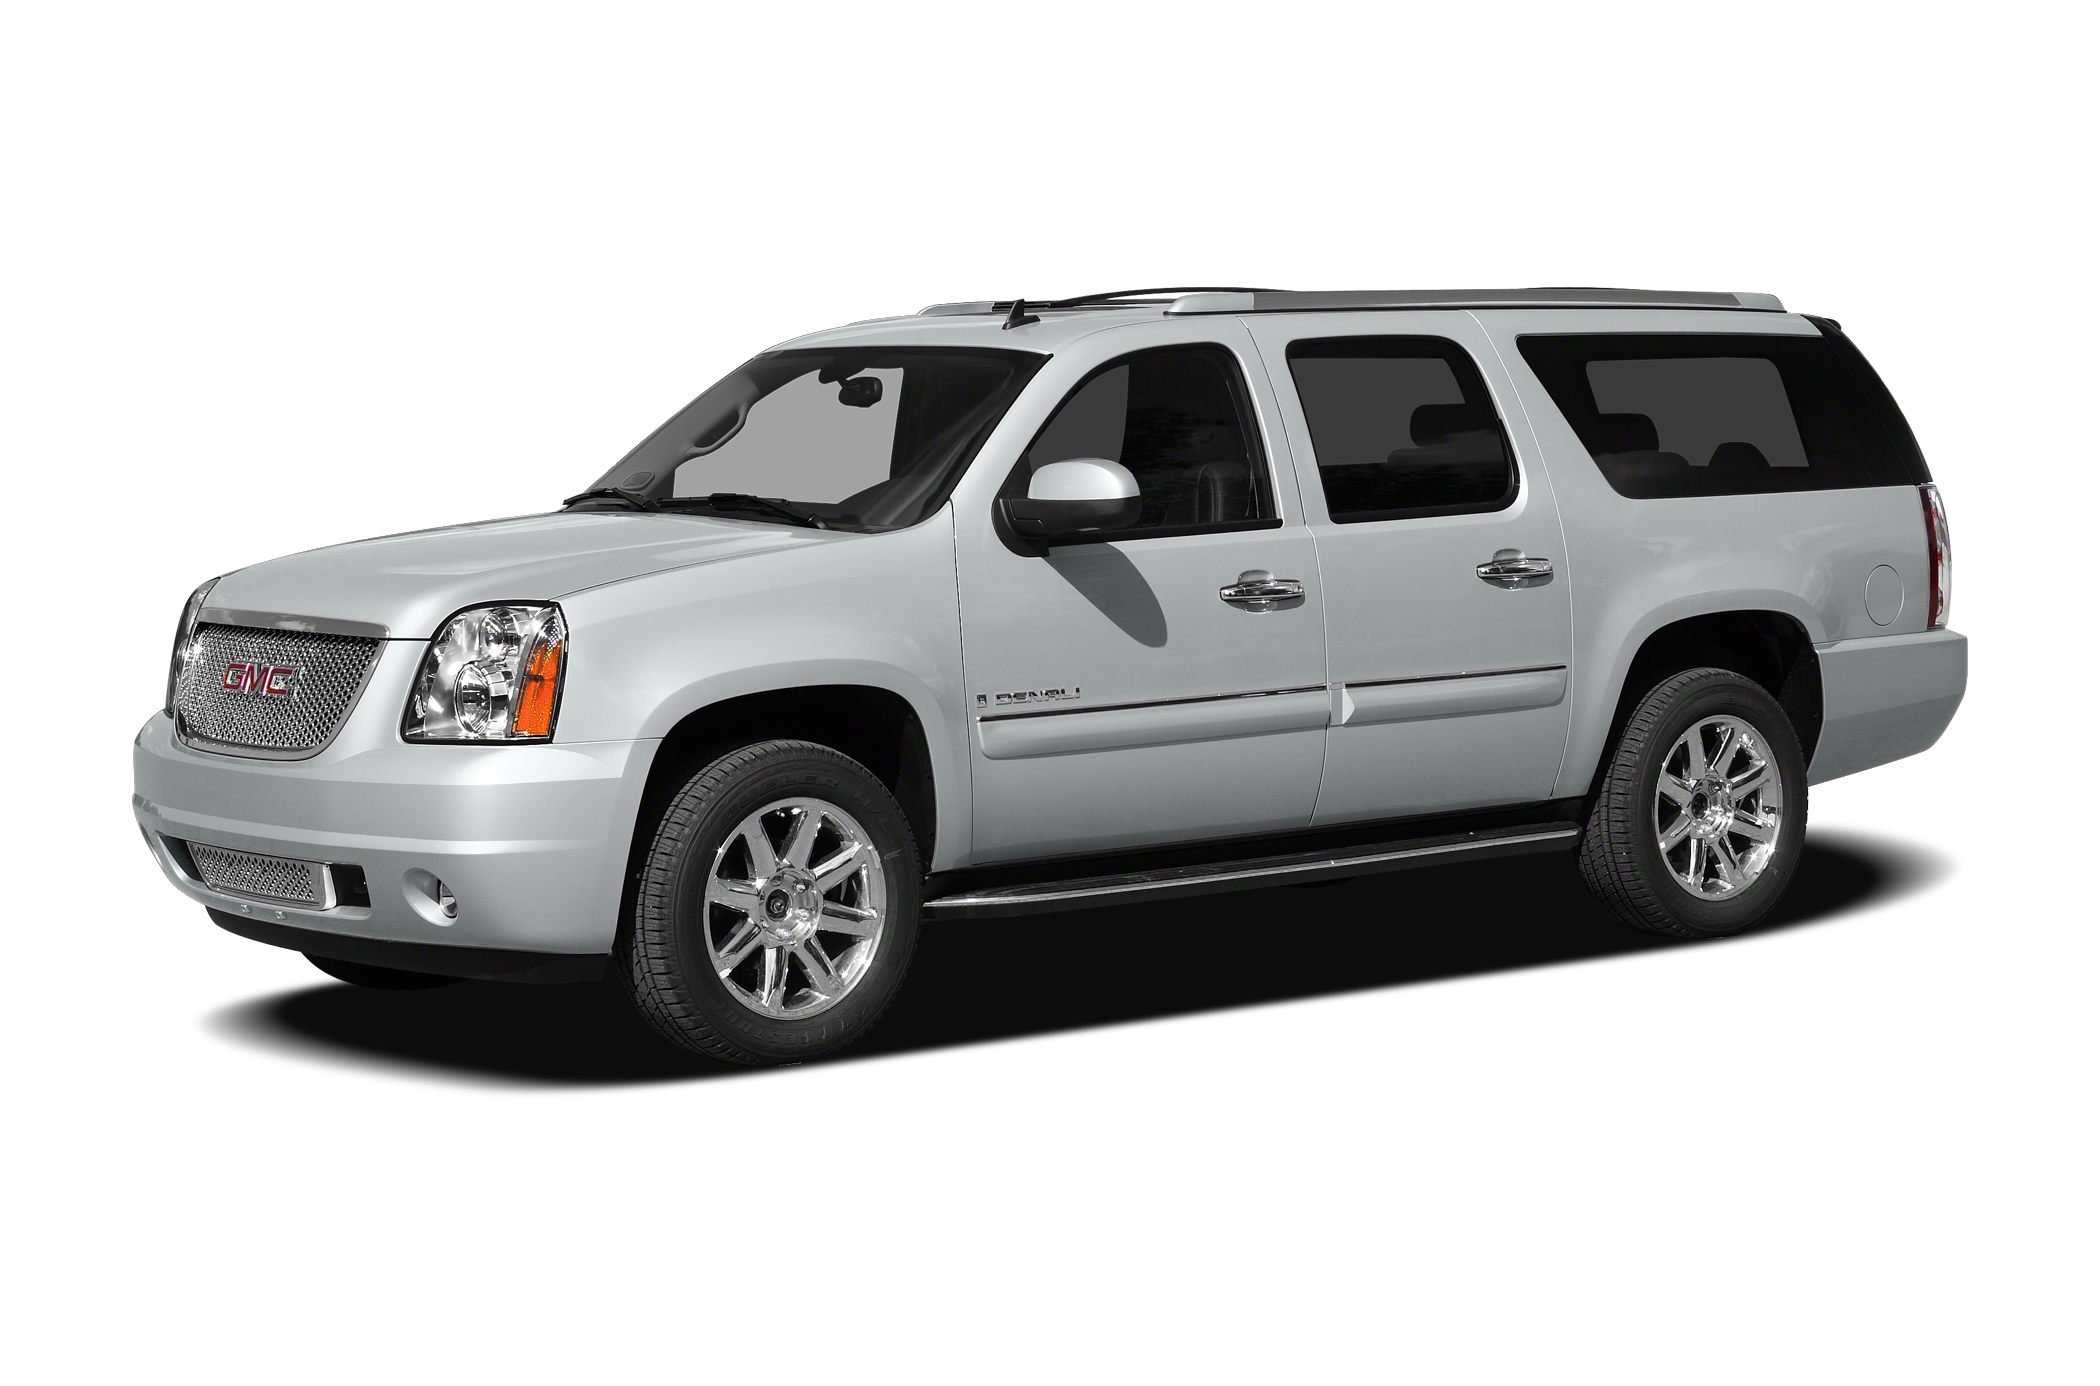 2010 GMC Yukon XL 1500 Denali Miles 93014Stock 1464 VIN 1GKUKMEF2AR189851